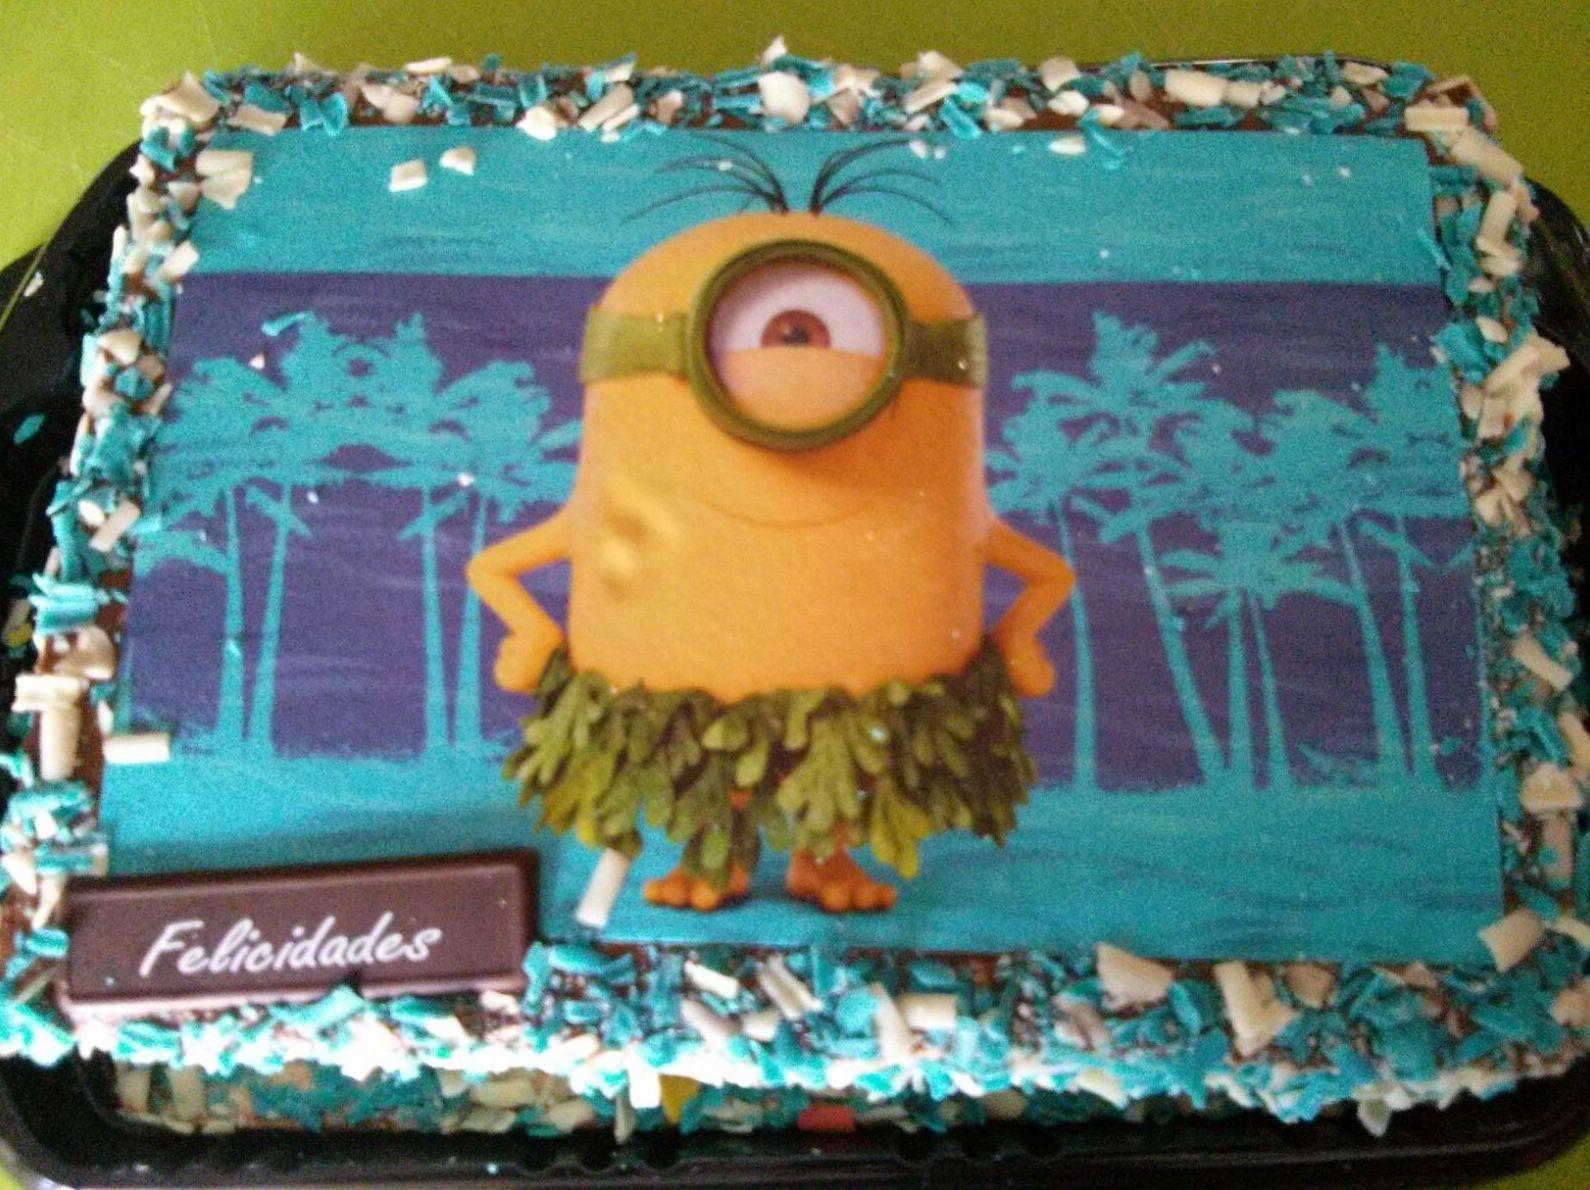 Cumpleaños infantiles para celiacos en Torrelodones